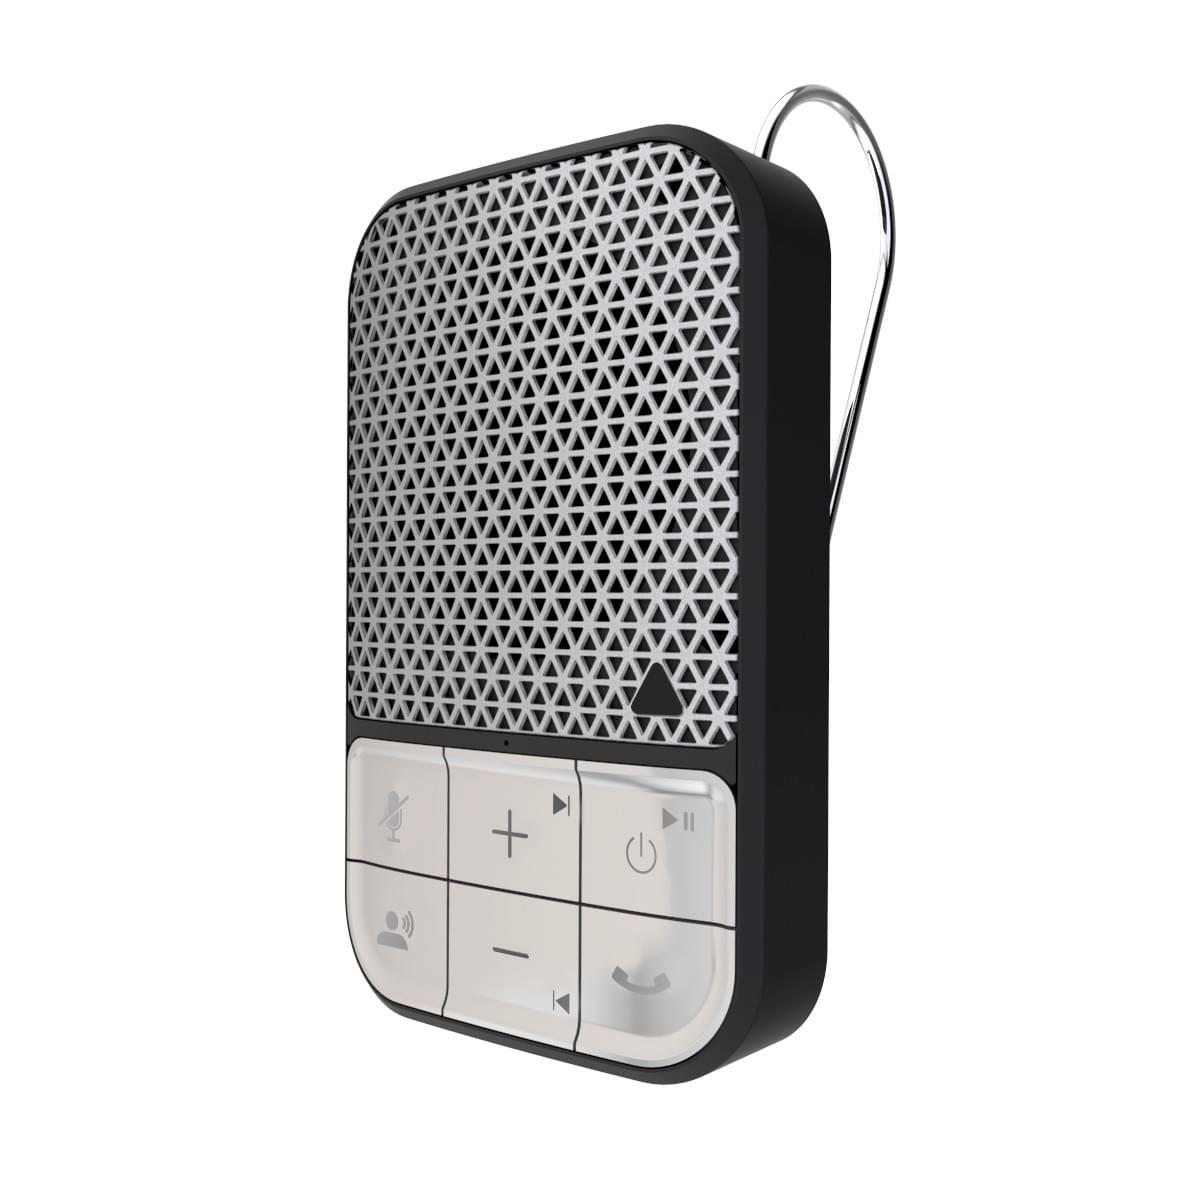 Car Kit/Speakerphone ZGEXSP-BS0 - Accessoire téléphonie ZAGG - 0